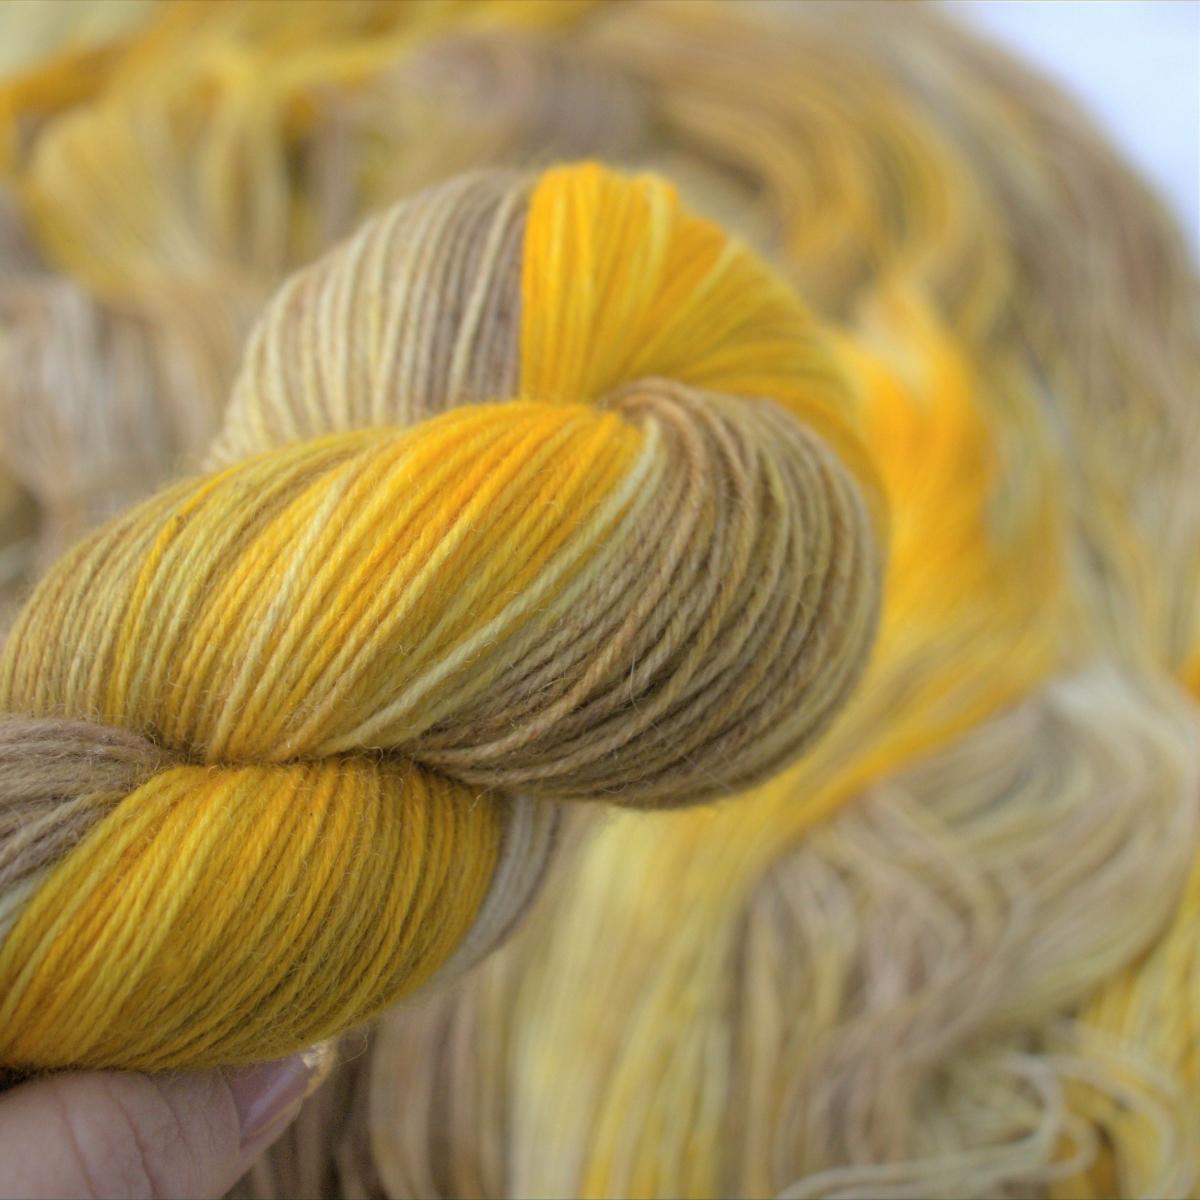 woodico.pro hand dyed yarn 049 4 1200x1200 - Hand dyed yarn / 049